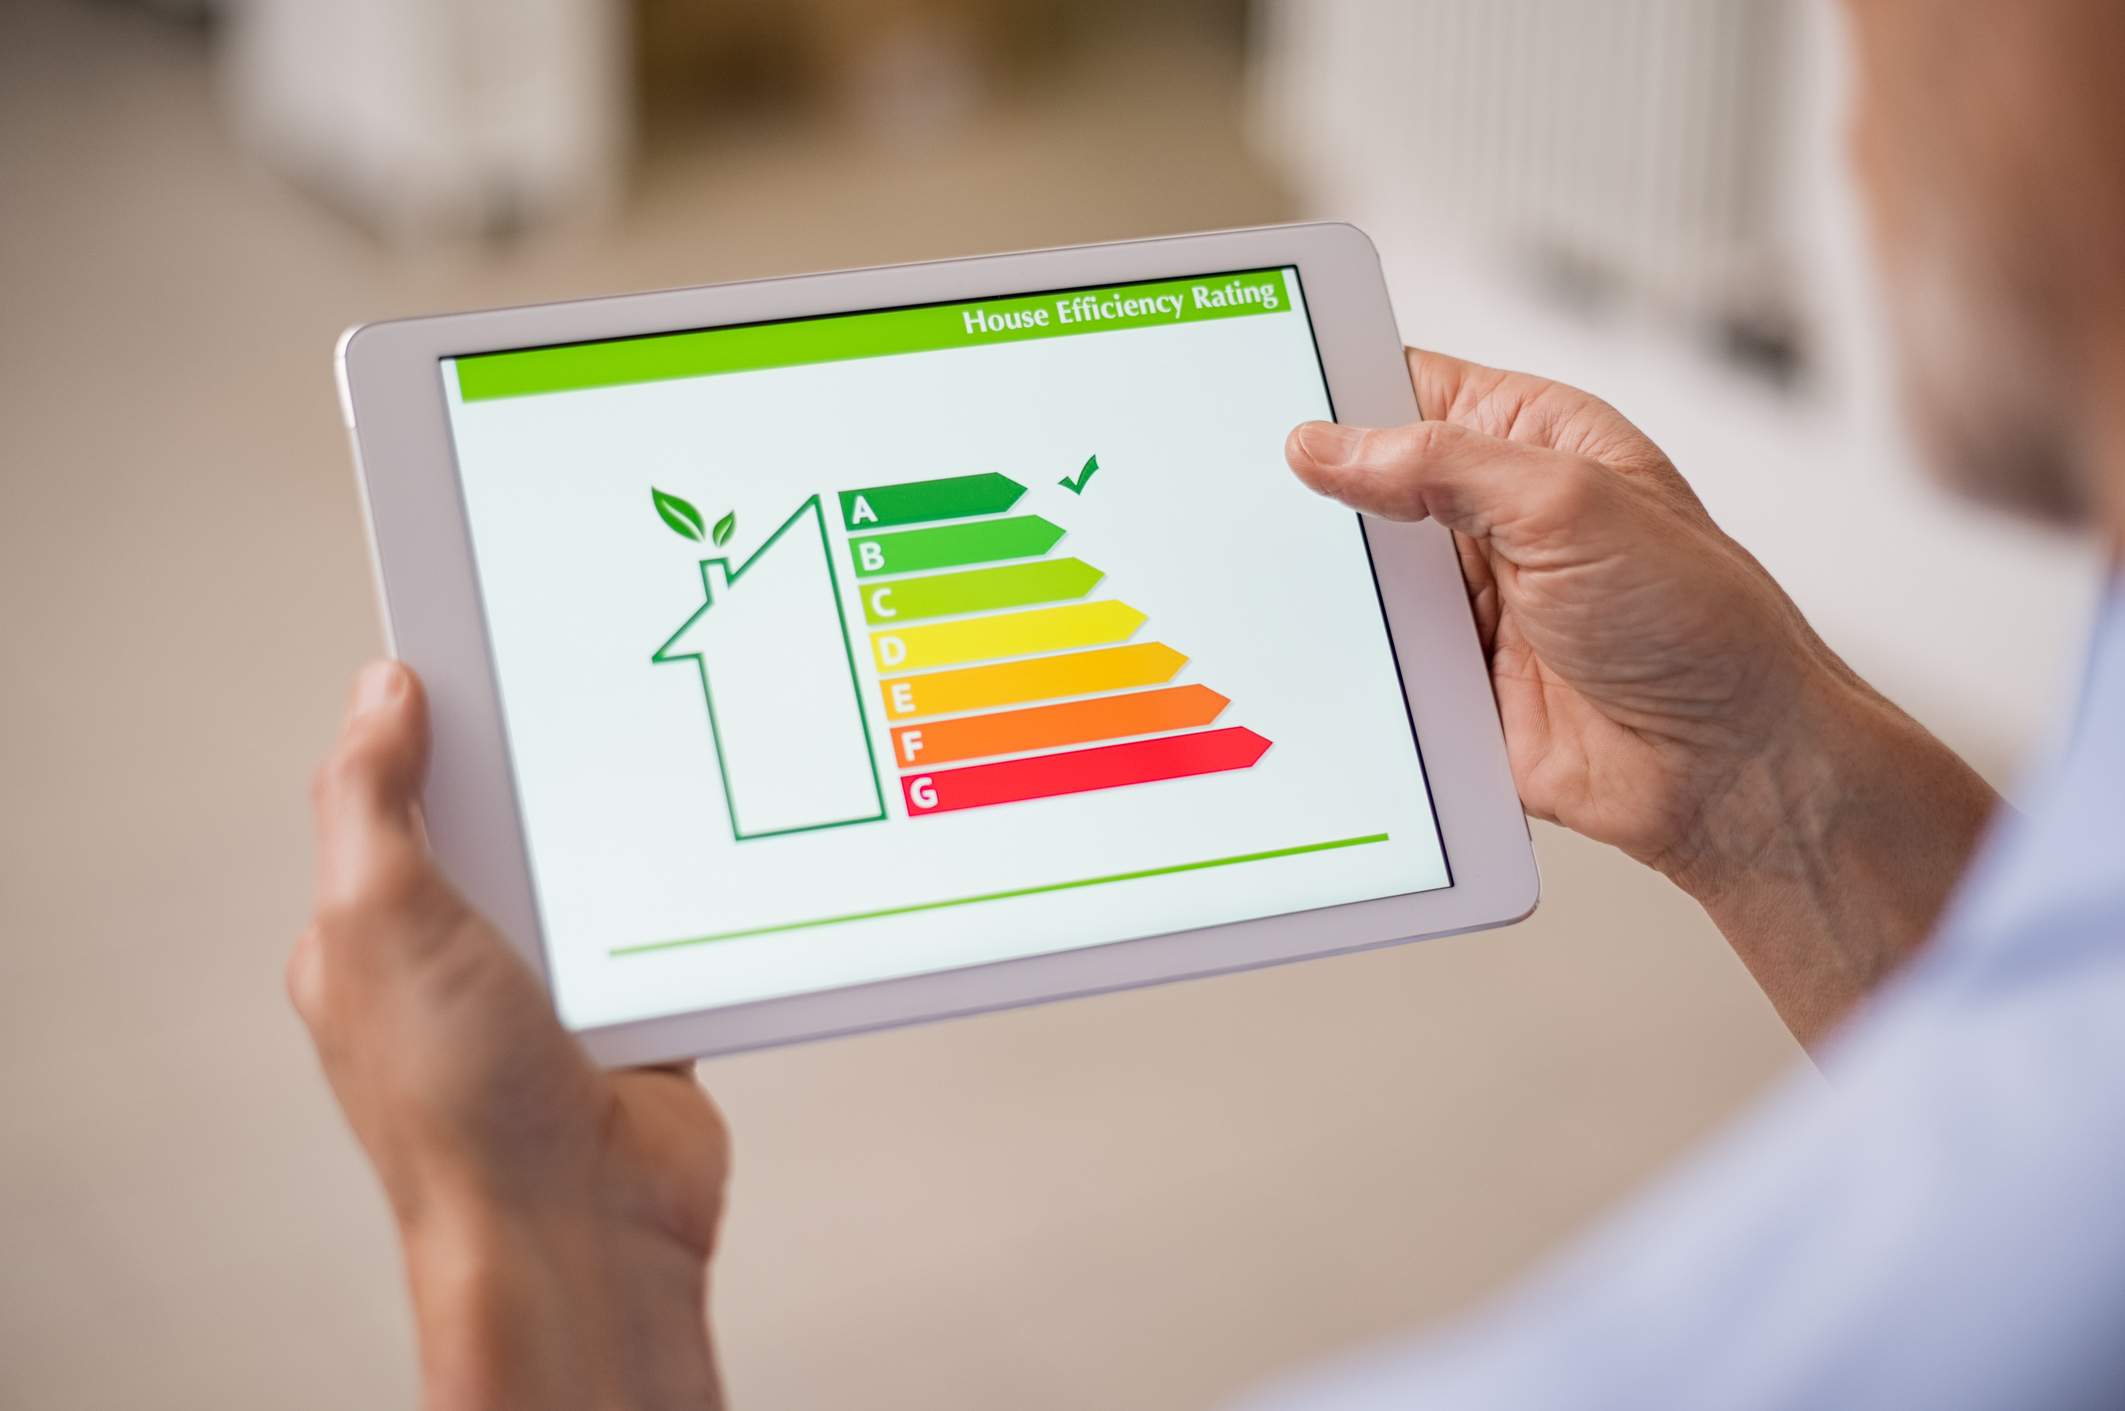 Energy efficiency house rating